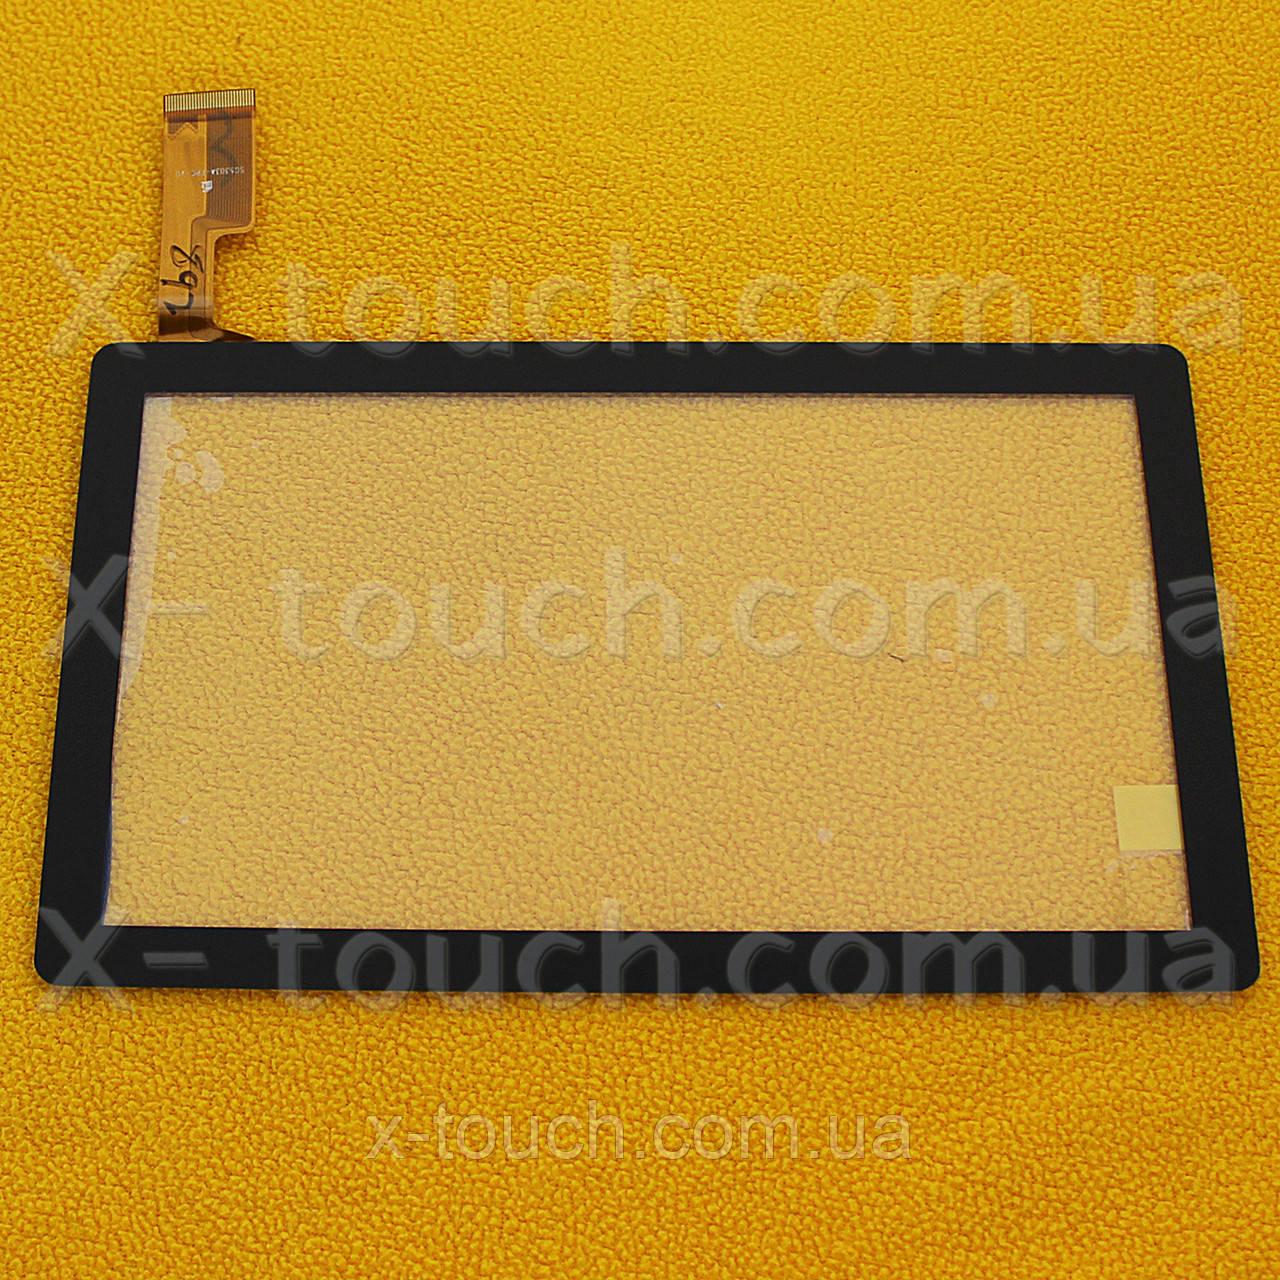 Тачскрин, сенсор CROWN B806 для планшета